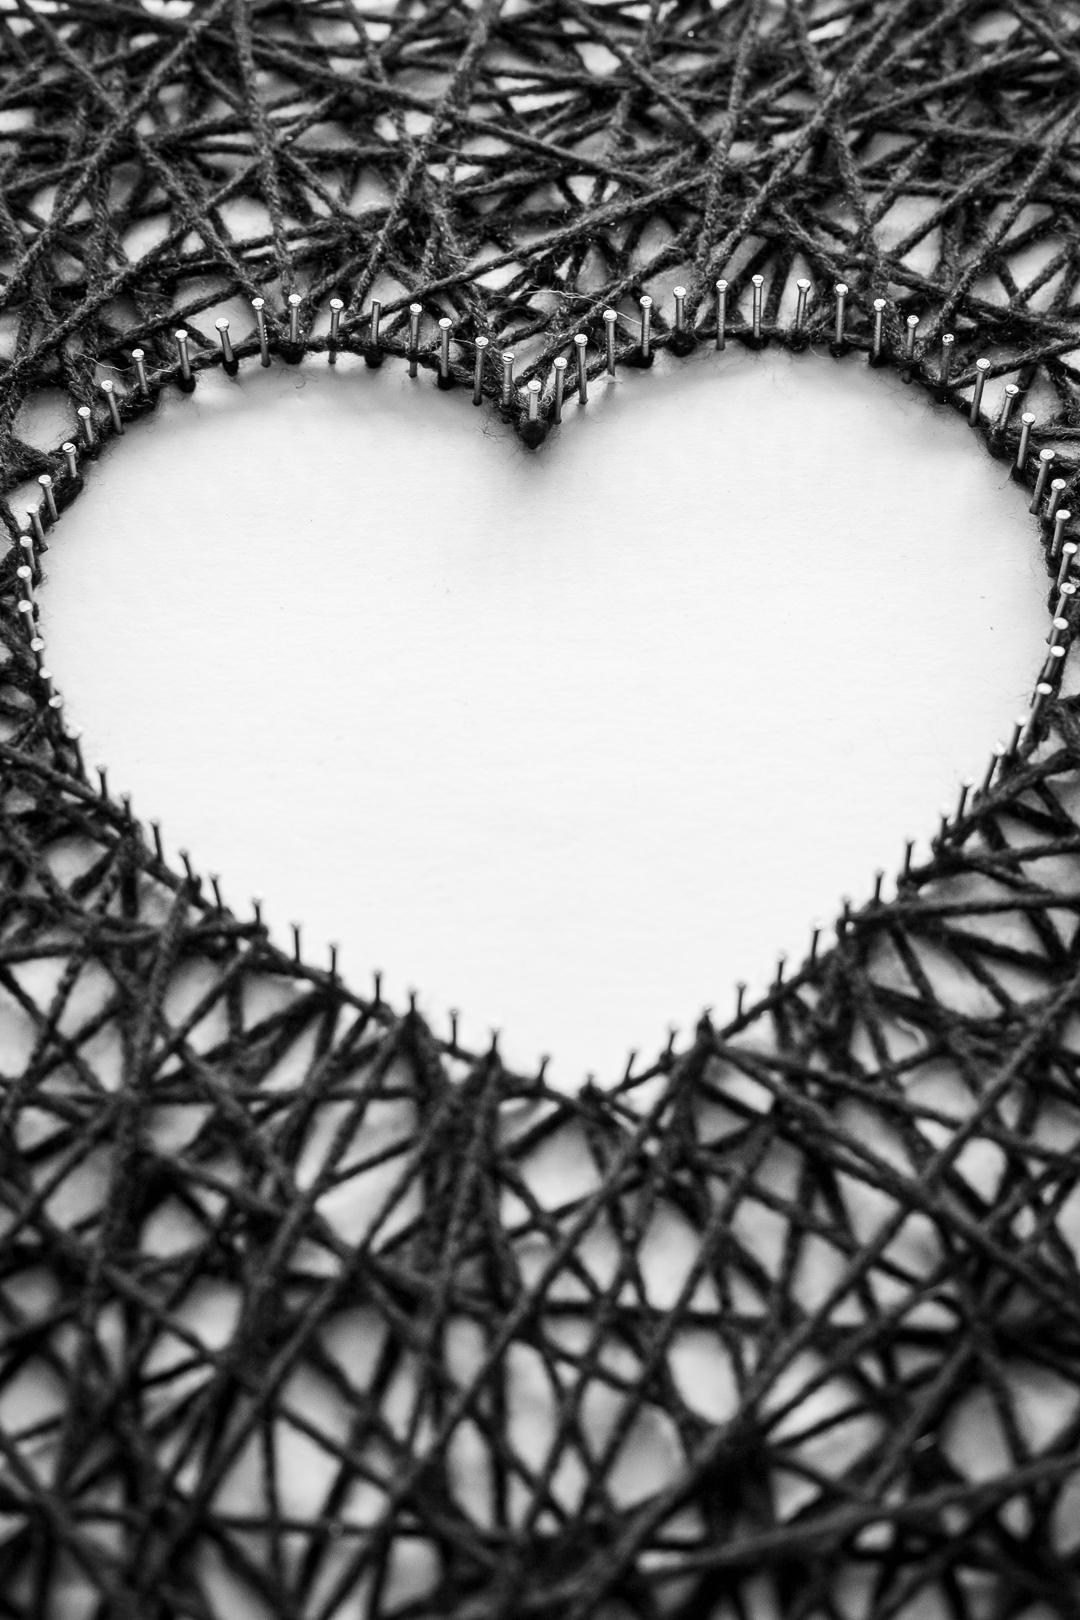 Close up image of string art heart shape